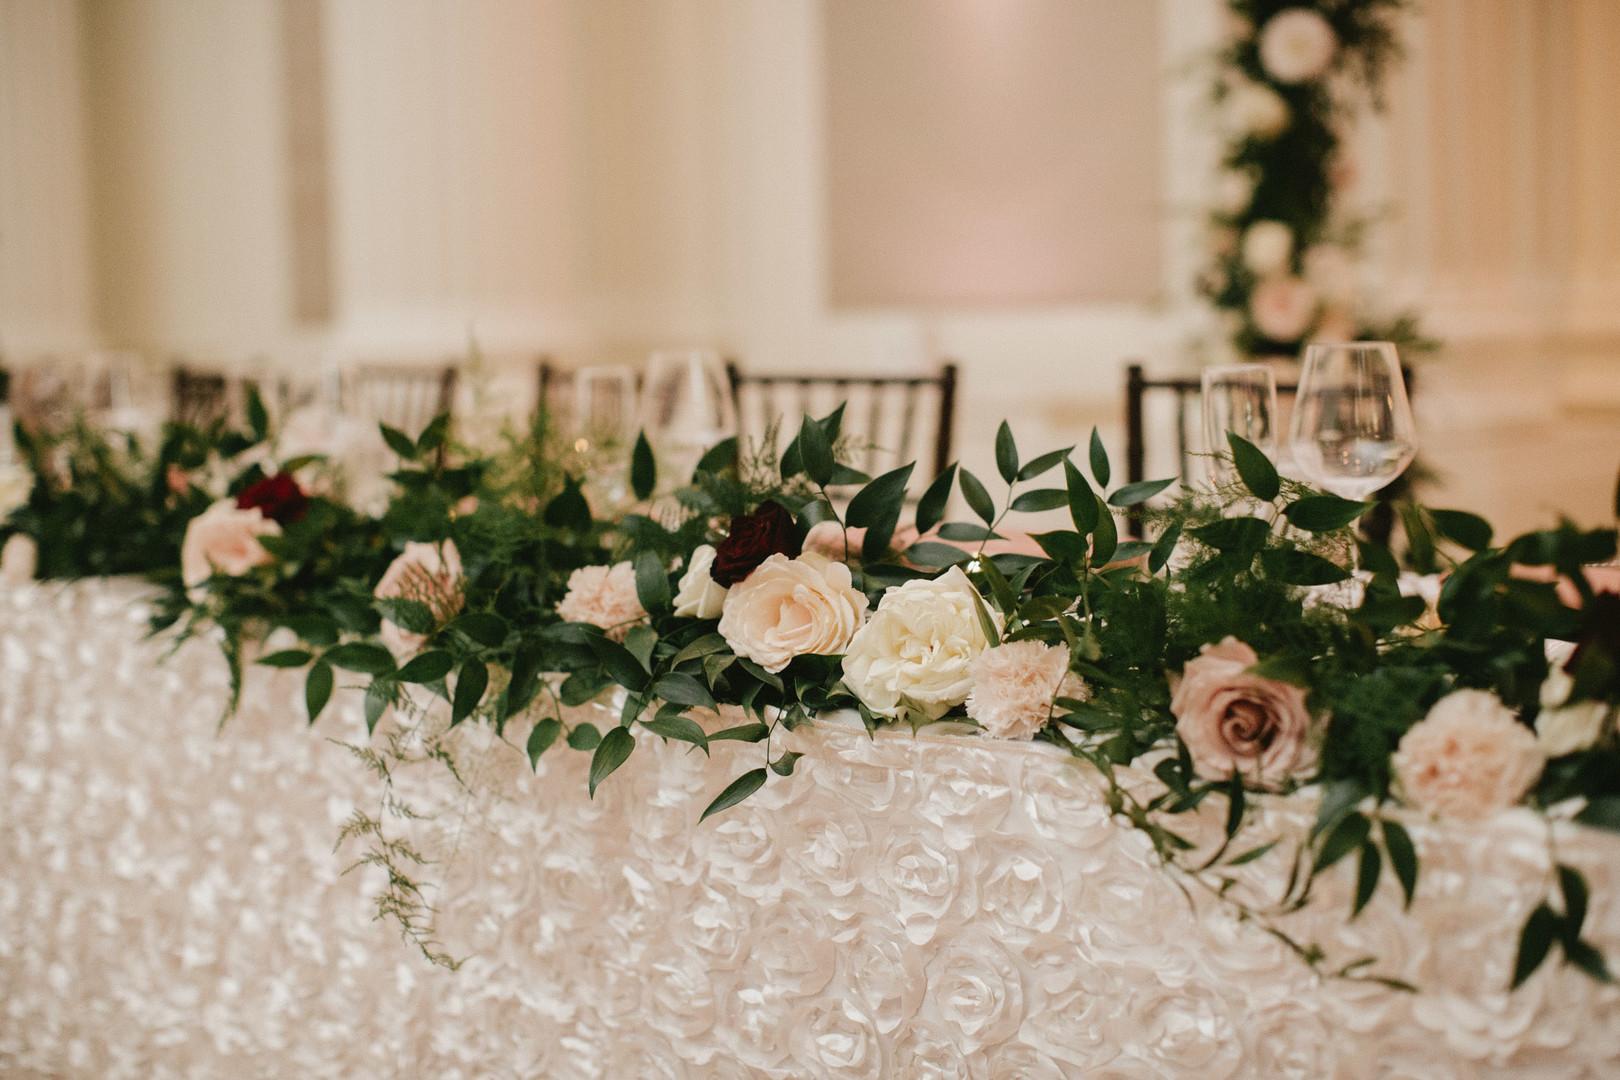 floral detail in wedding reception